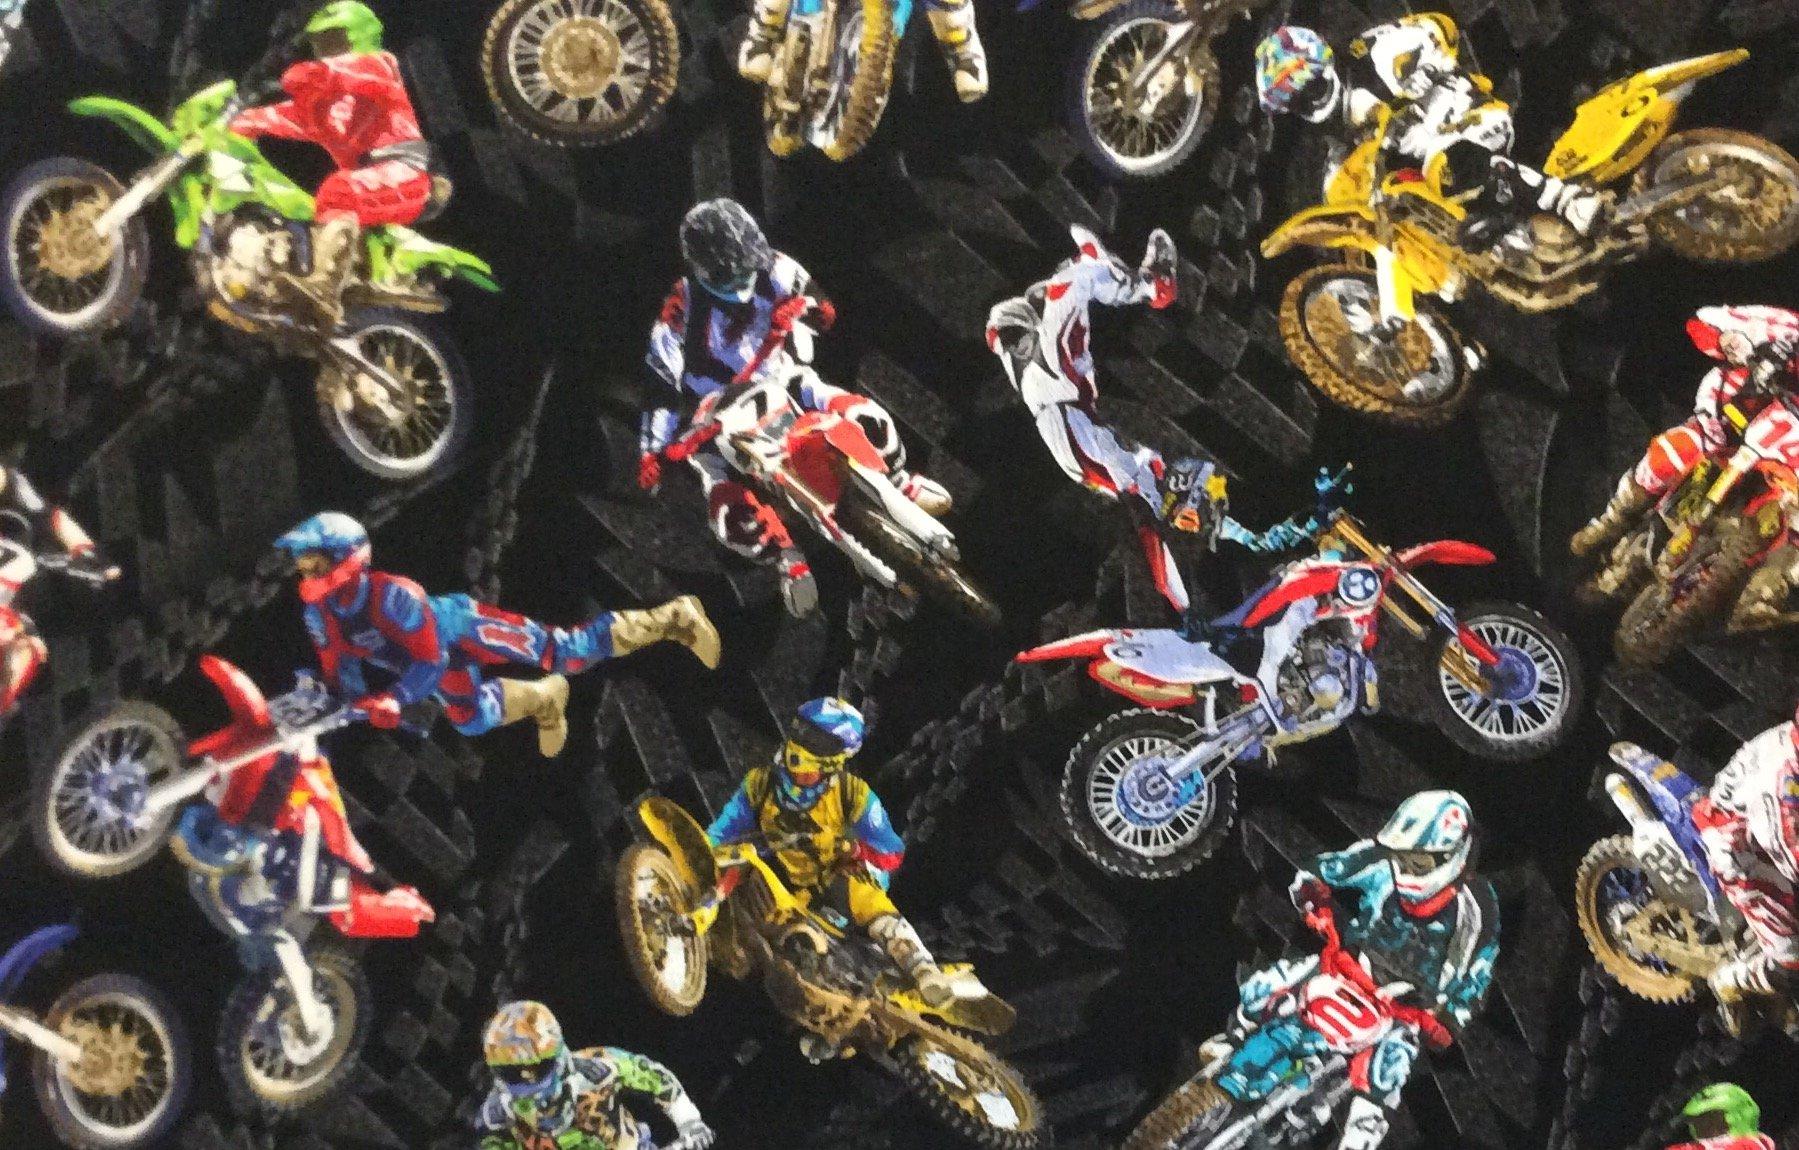 BE06 Motorcycle Dirt Bike Racing Motocross Sport Harley Quilting ... : motorcycle quilting fabric - Adamdwight.com